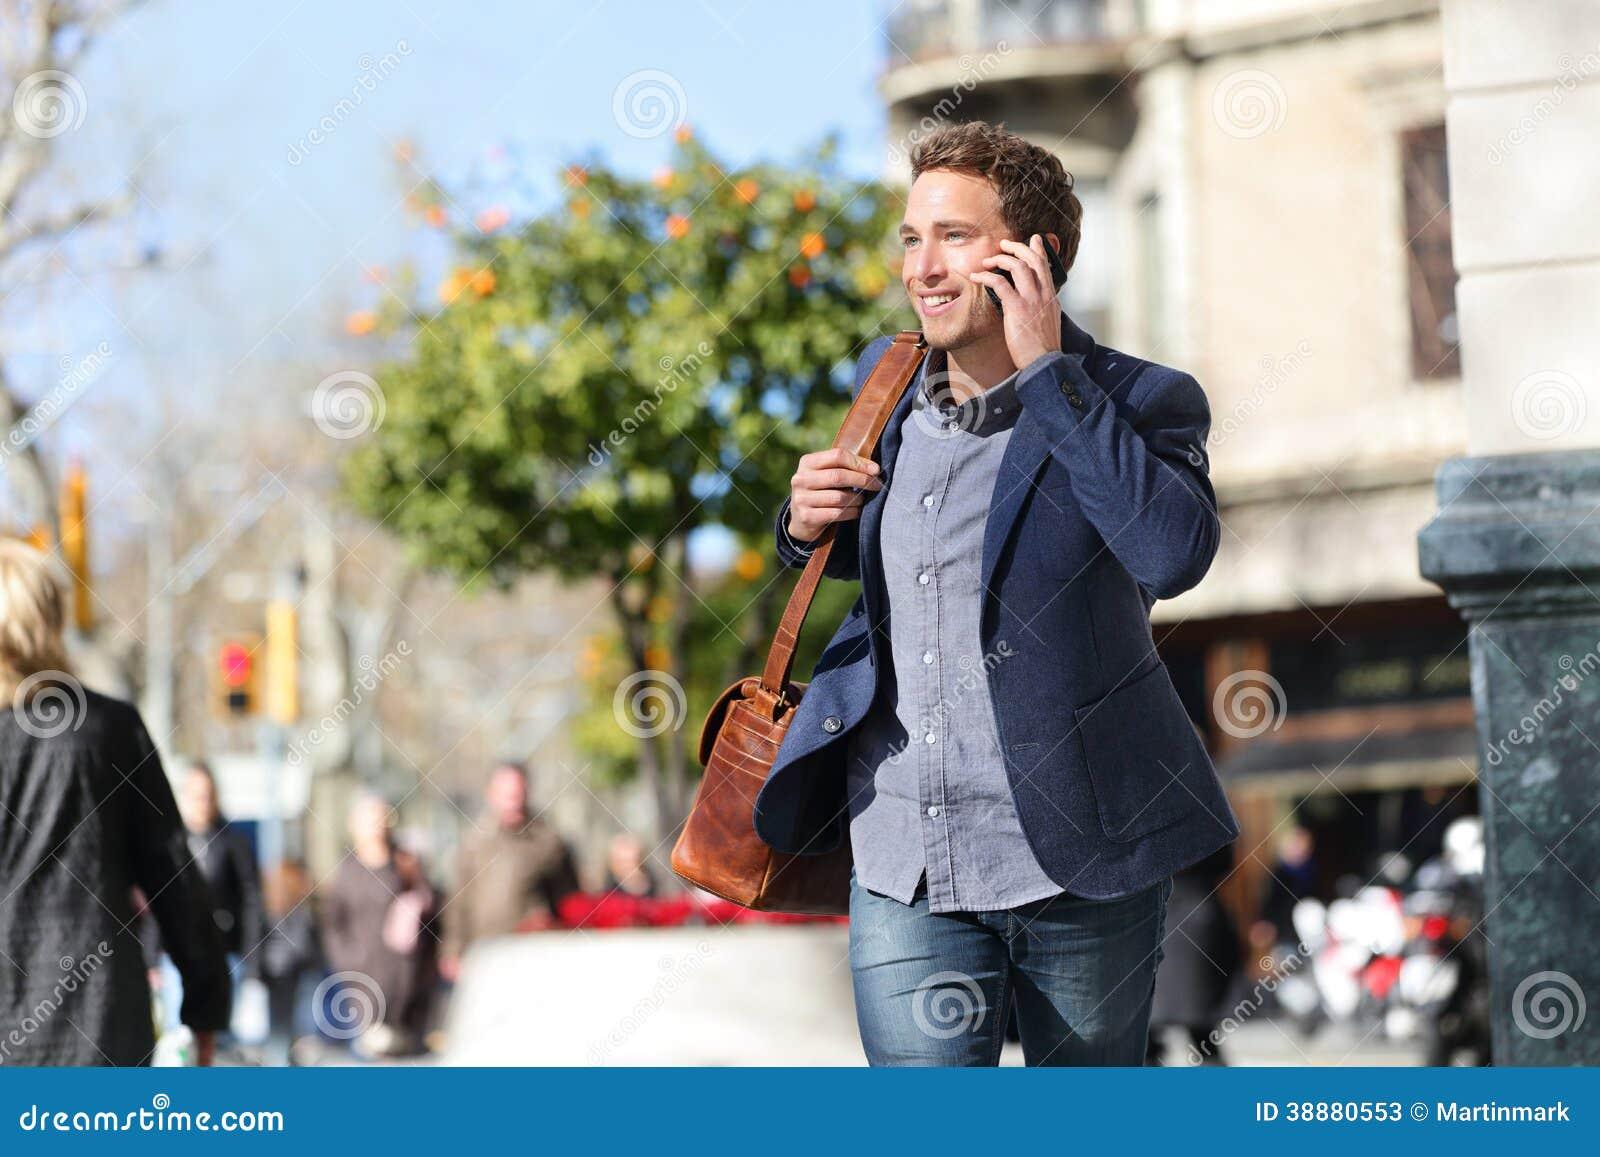 Young urban businessman on smart phone, Barcelona